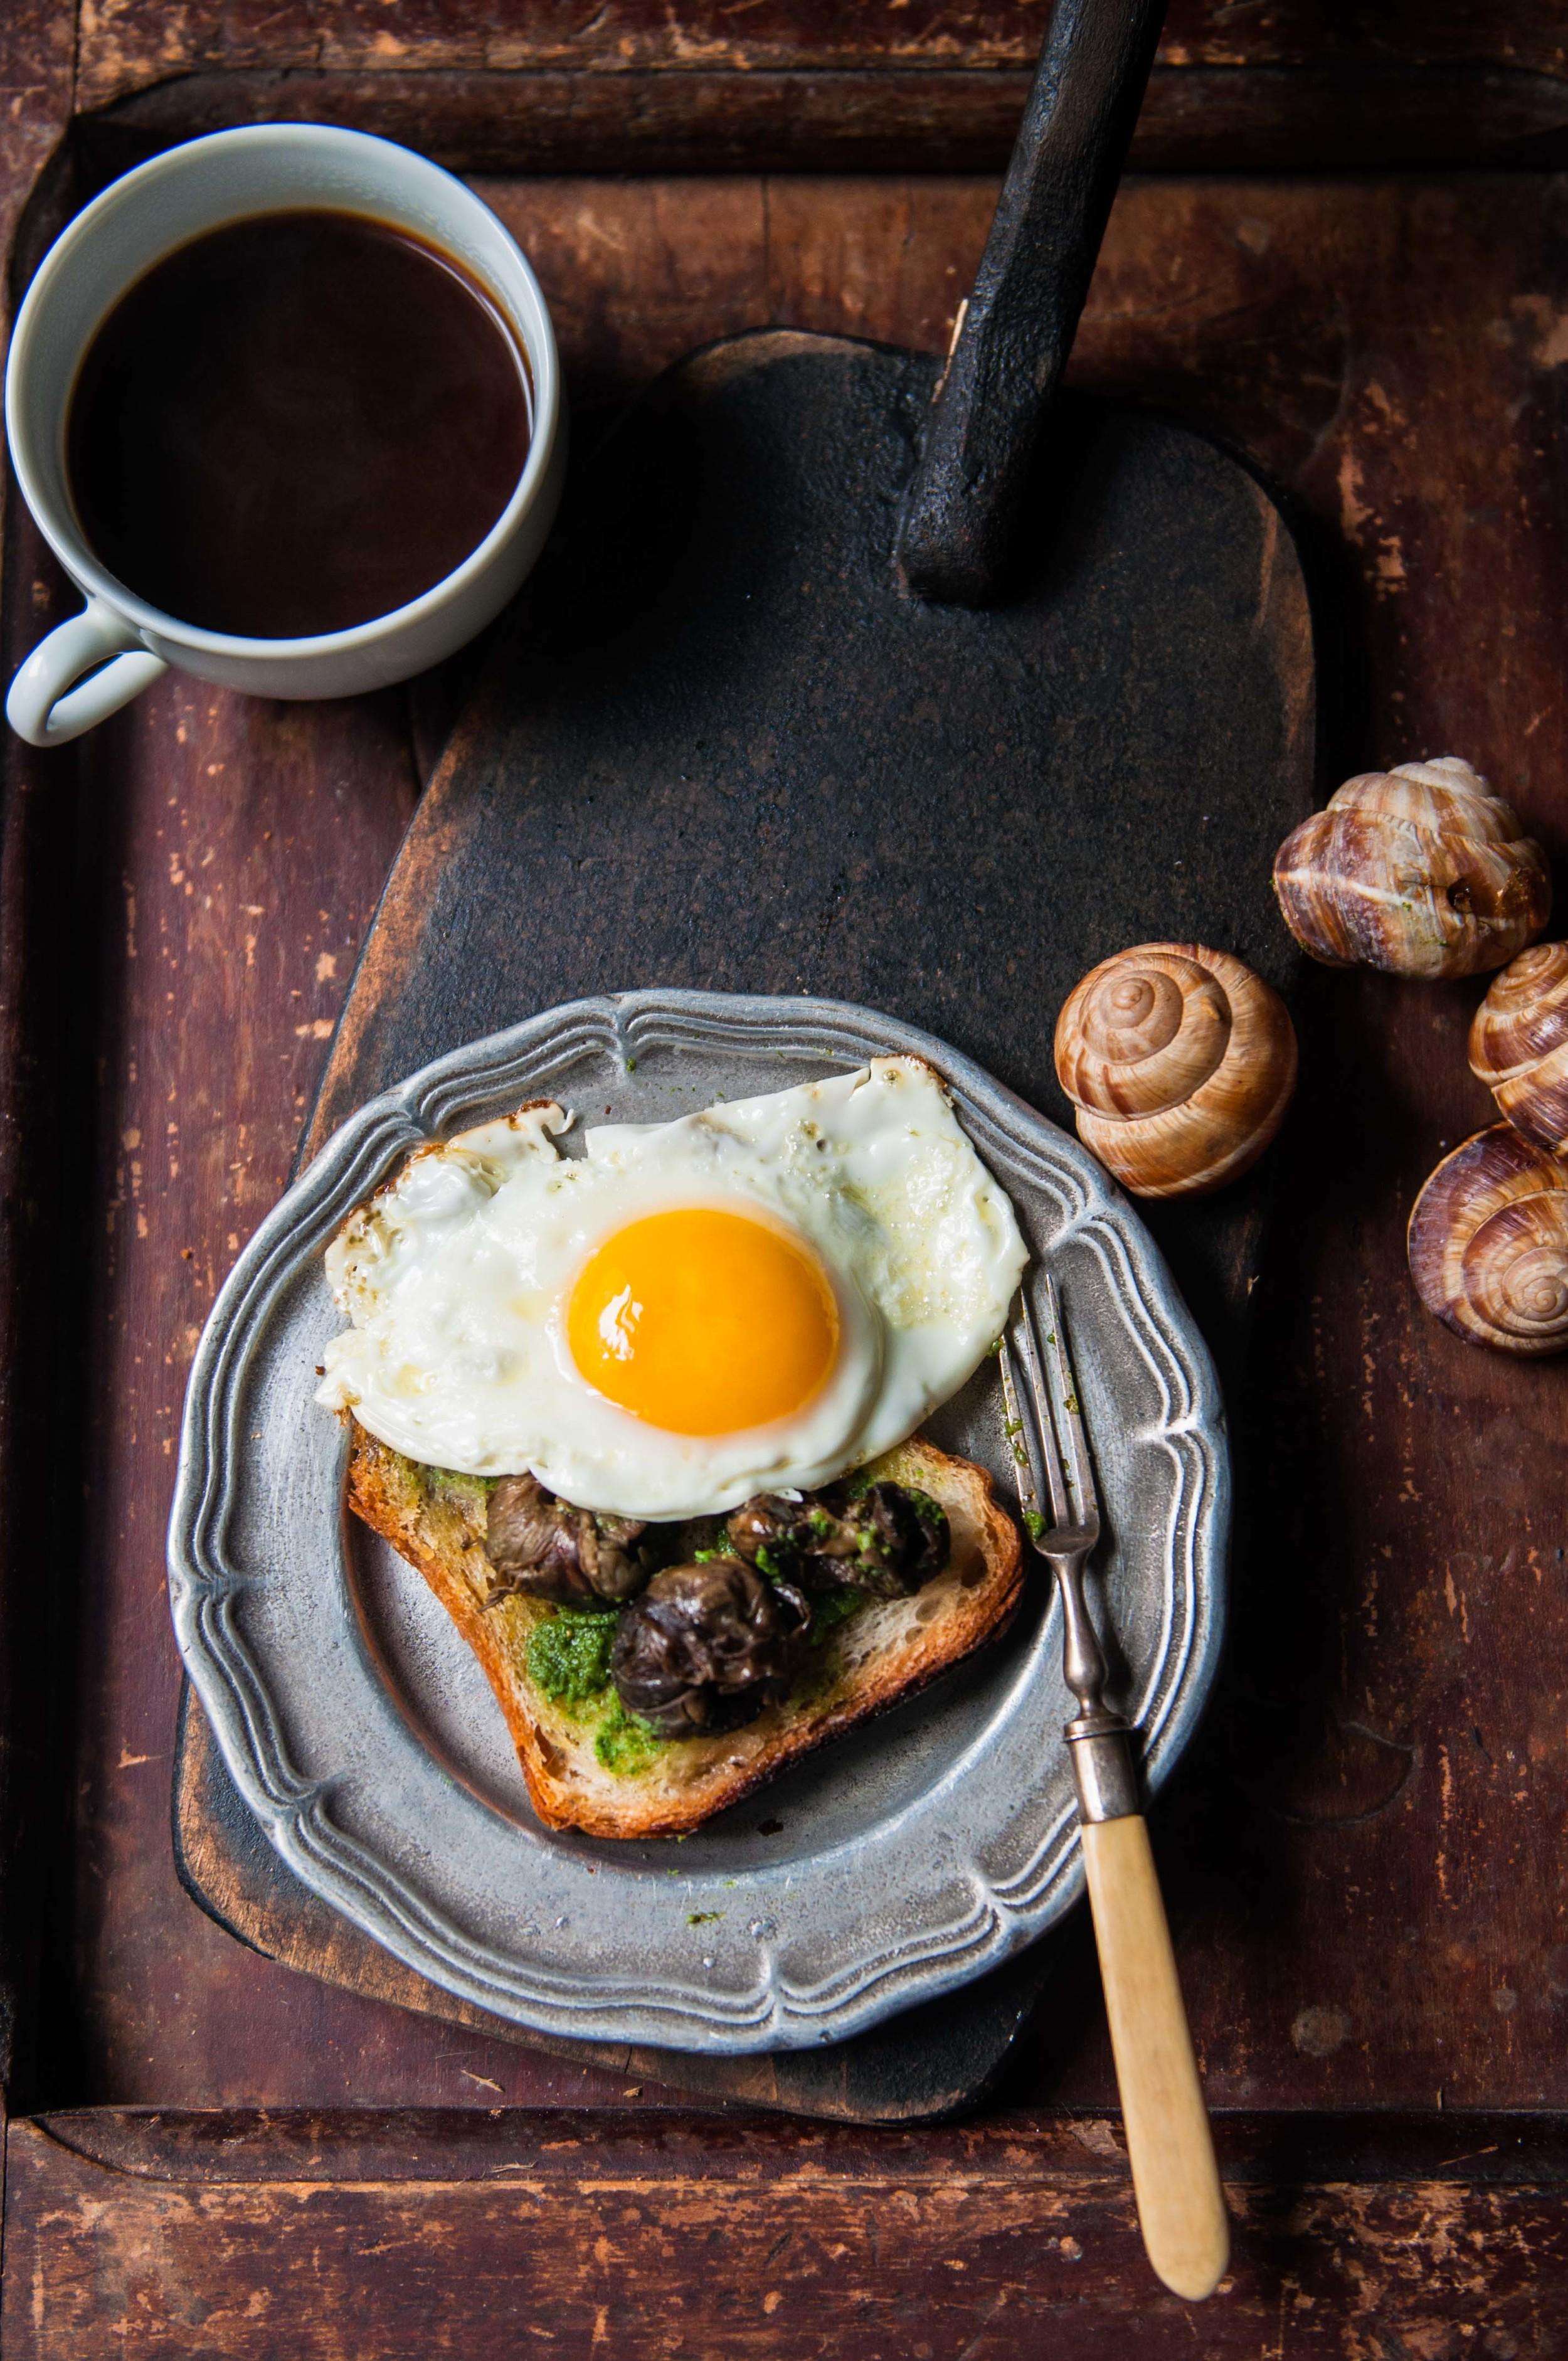 Pesto Roasted Escargots on Toast #putaneggonit